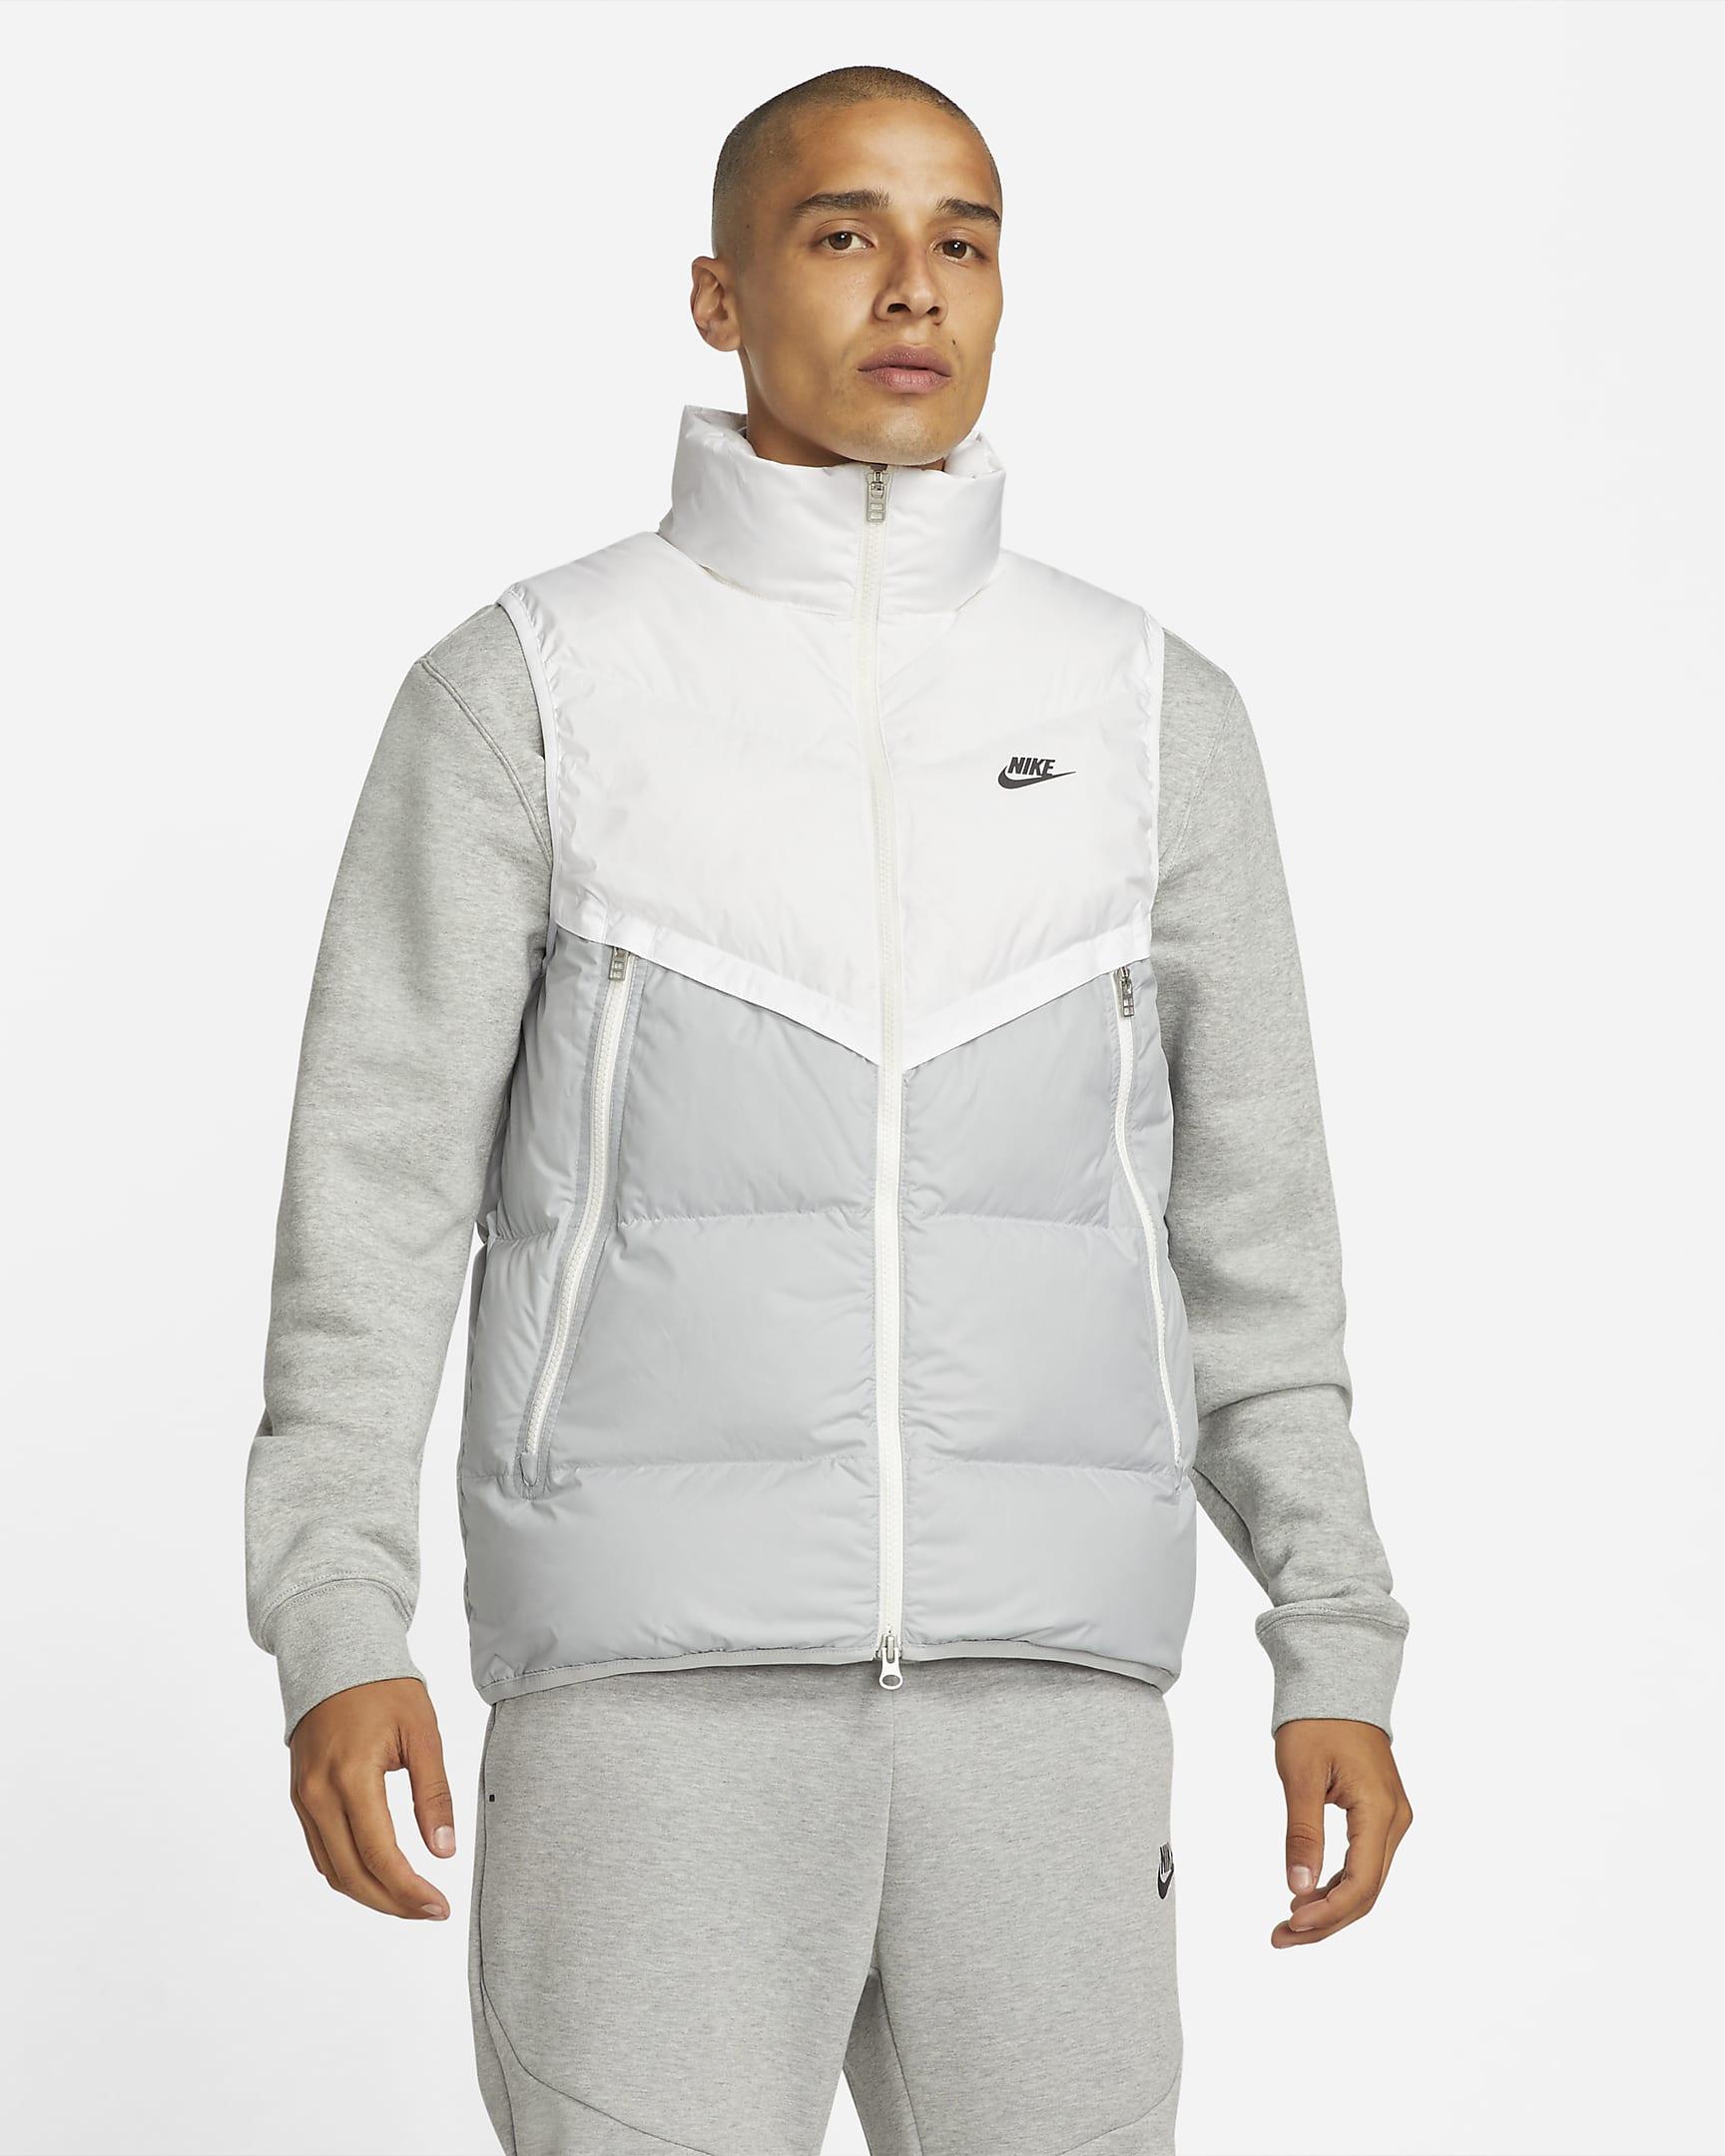 nike-sportswear-storm-fit-windrunner-mens-vest-mPN0RG.png